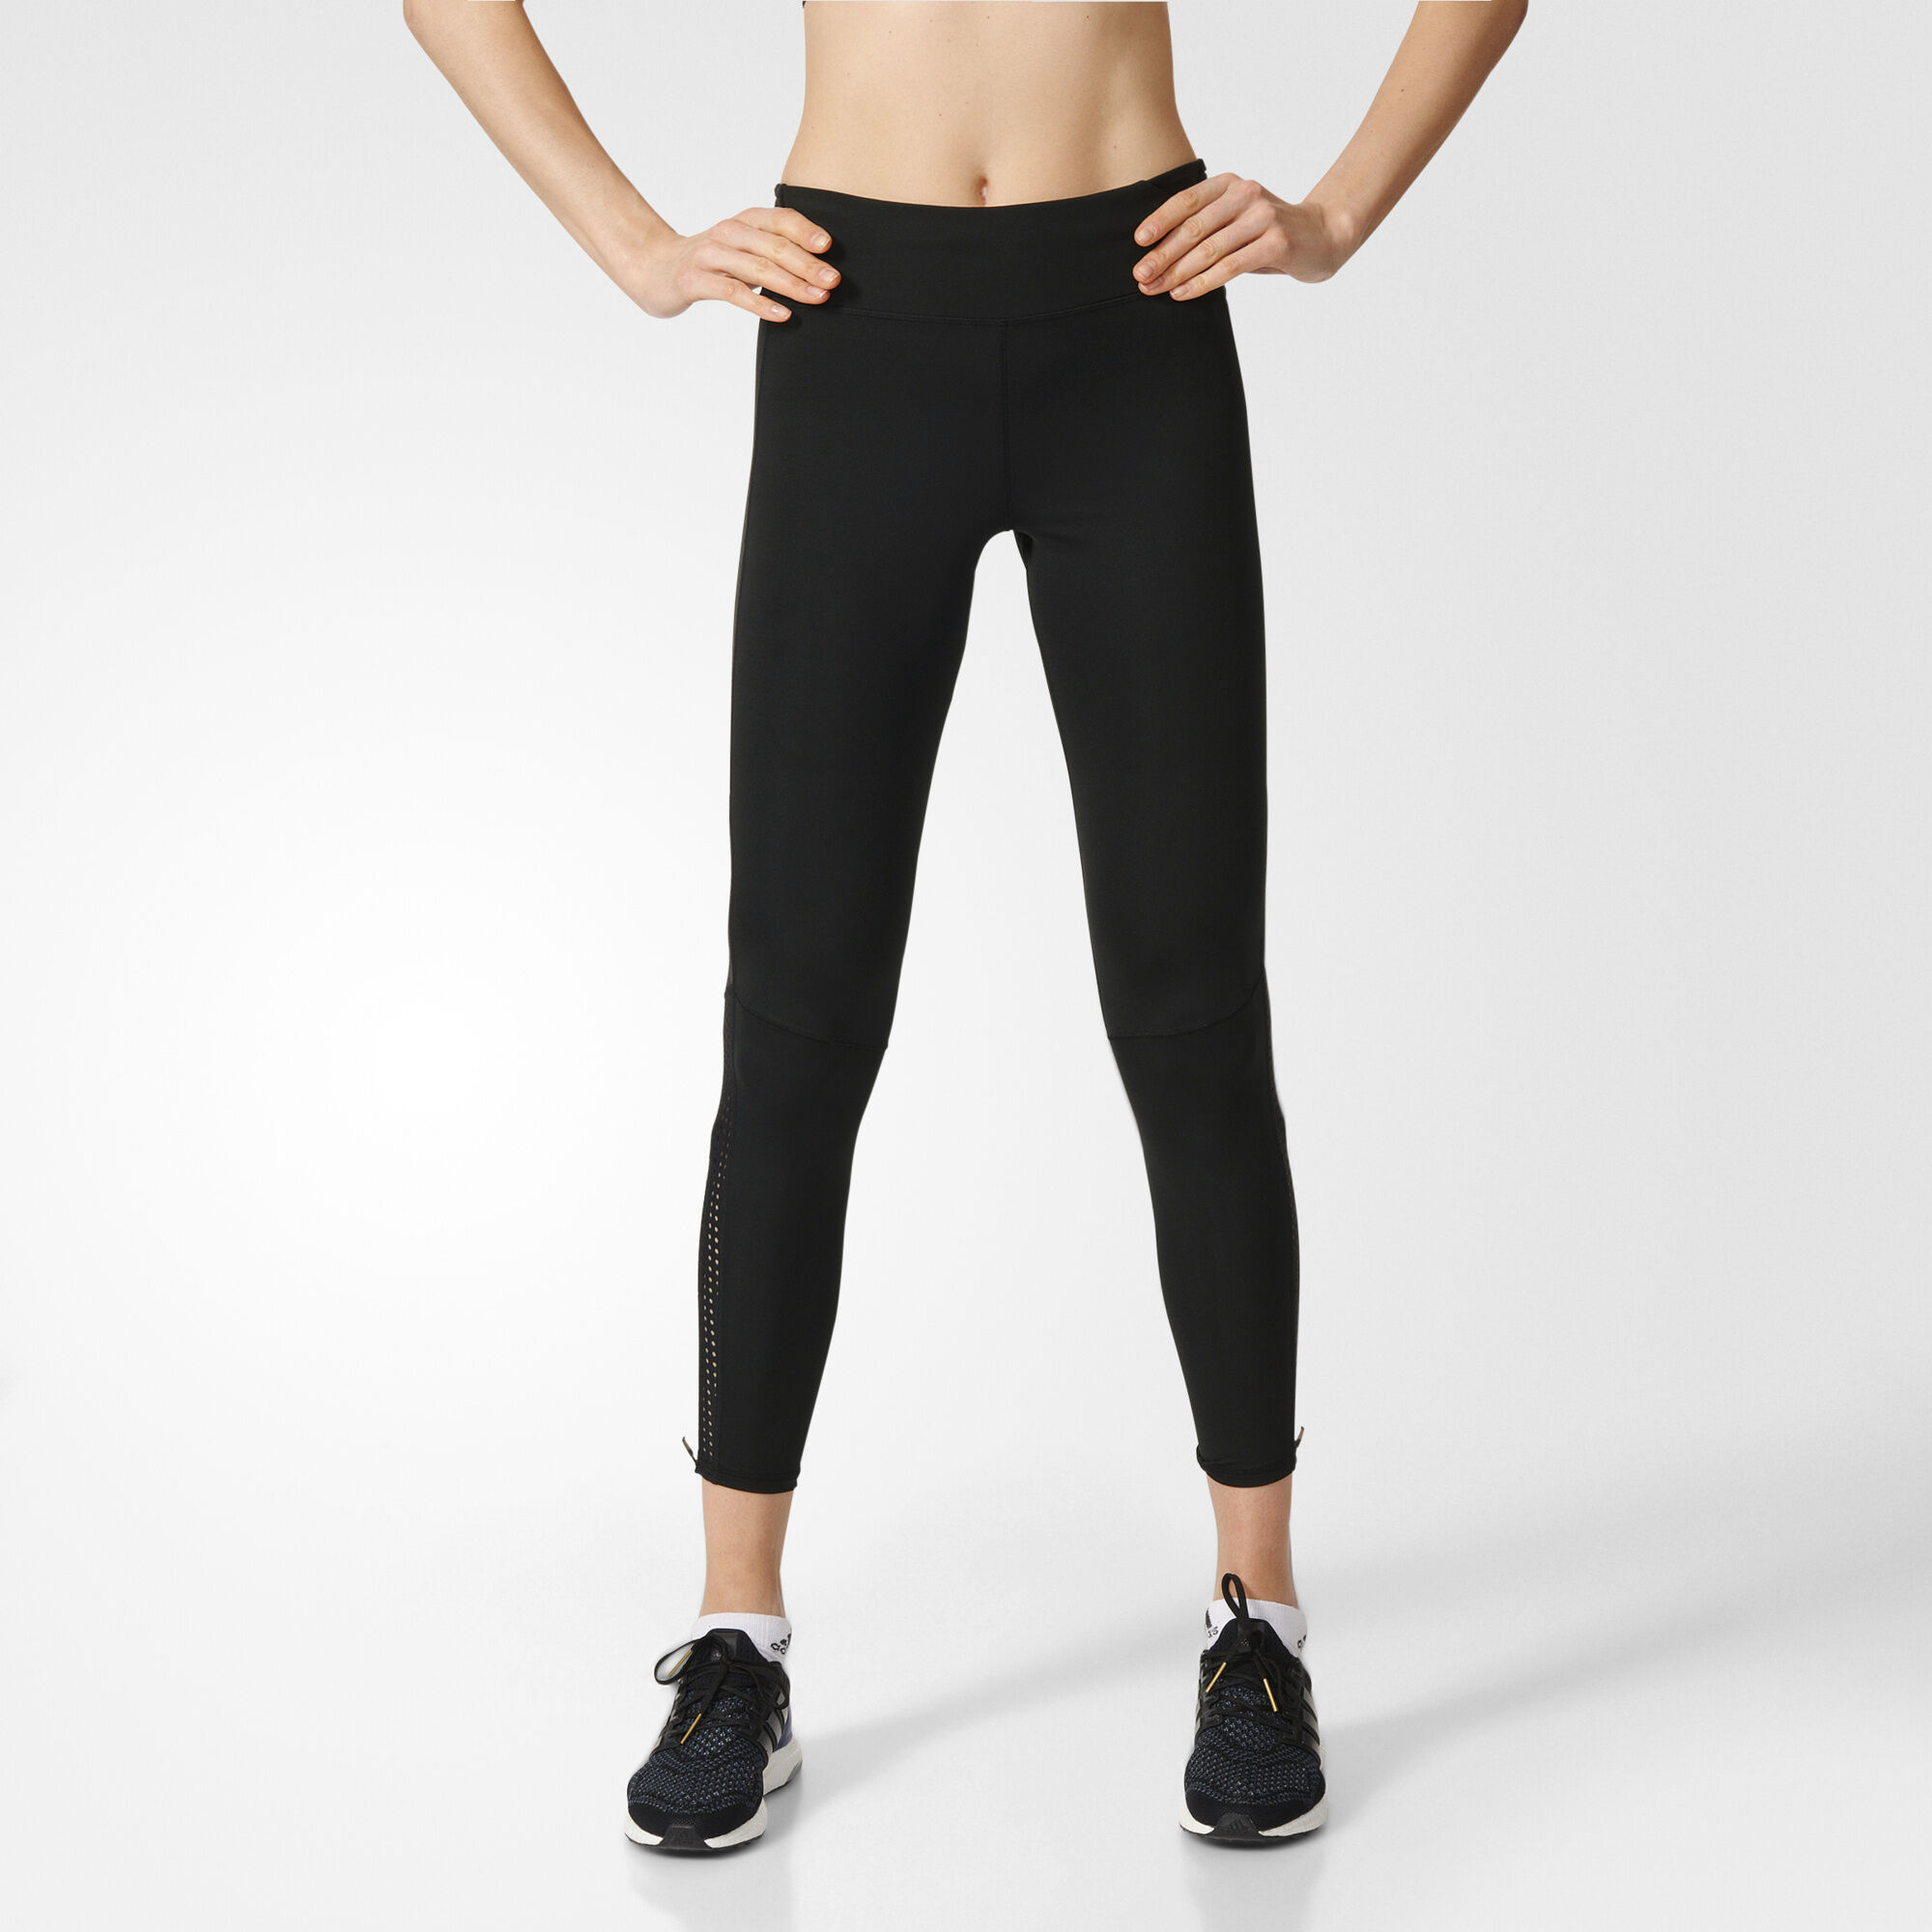 pantalon survetement femme adidas